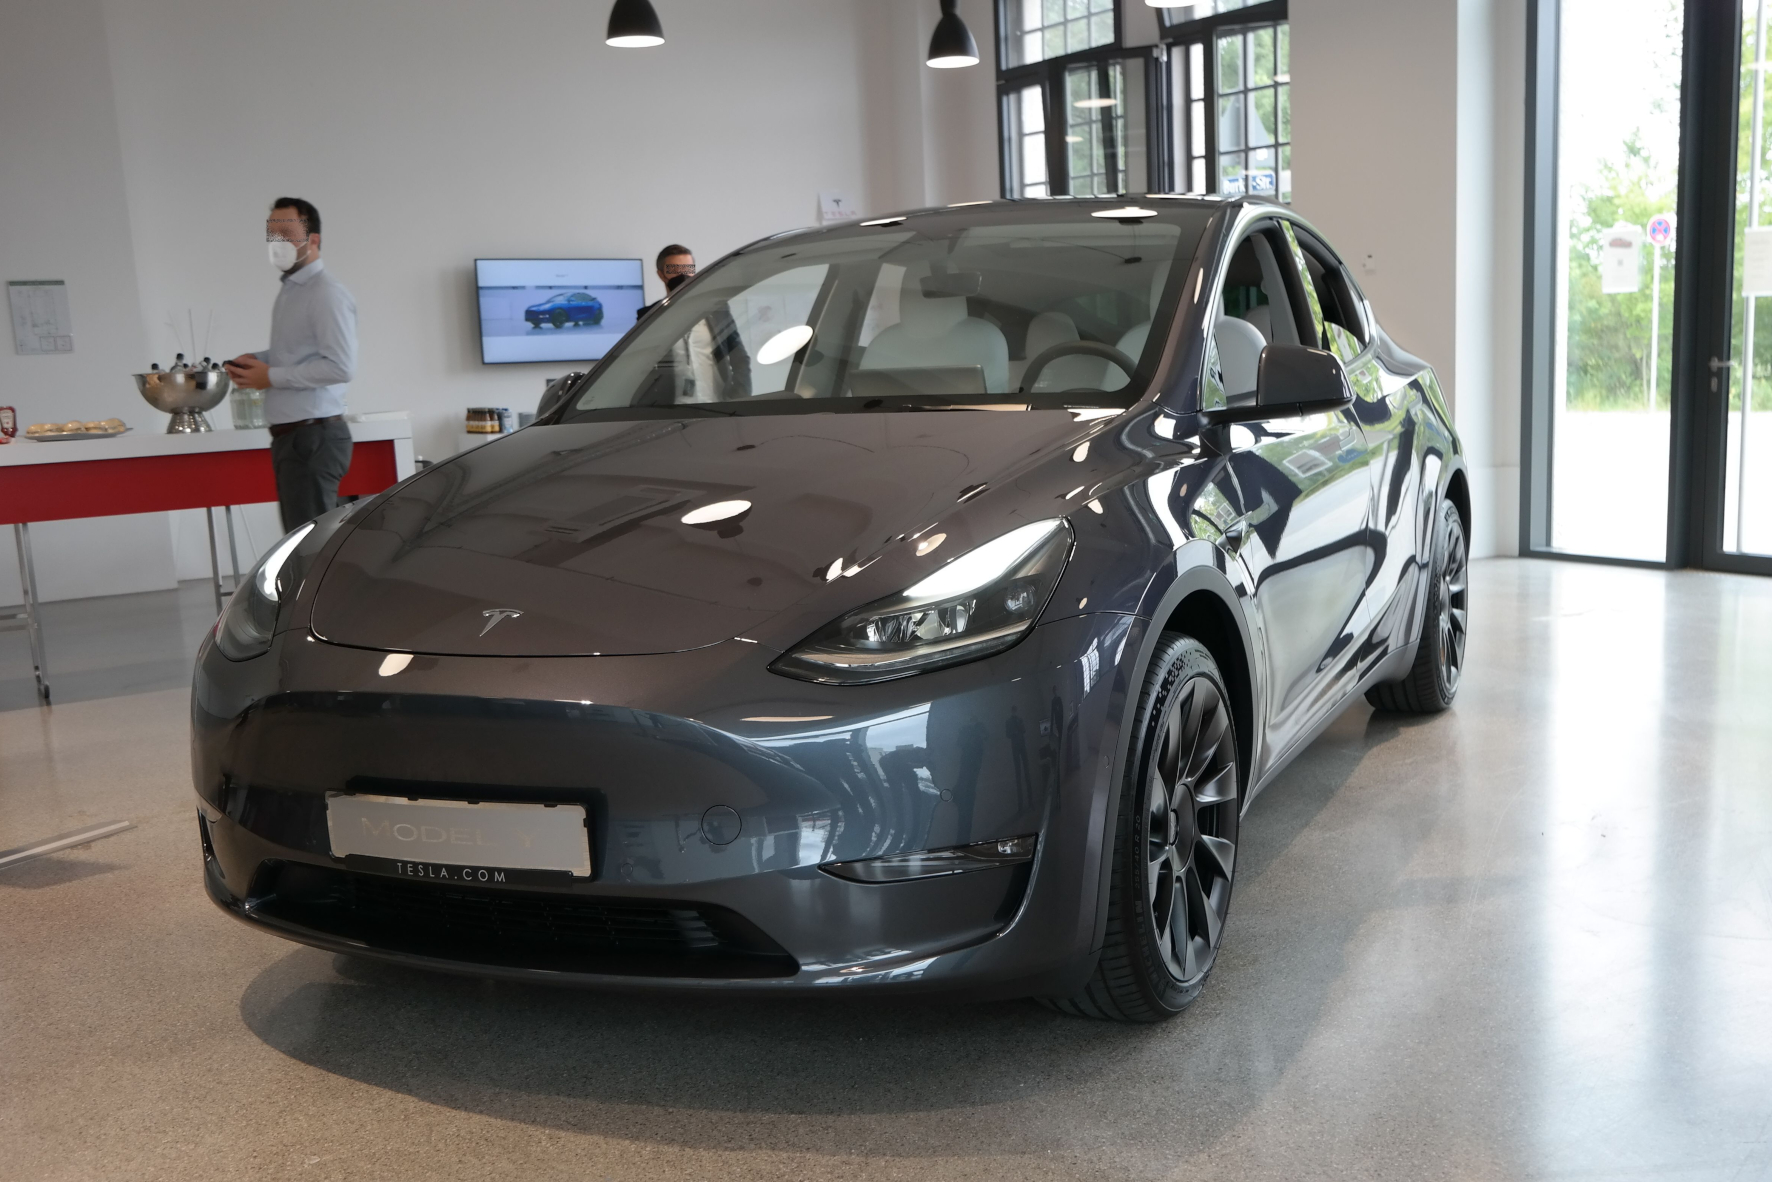 Neues Kompakt-SUV-Modell von Elon Musk